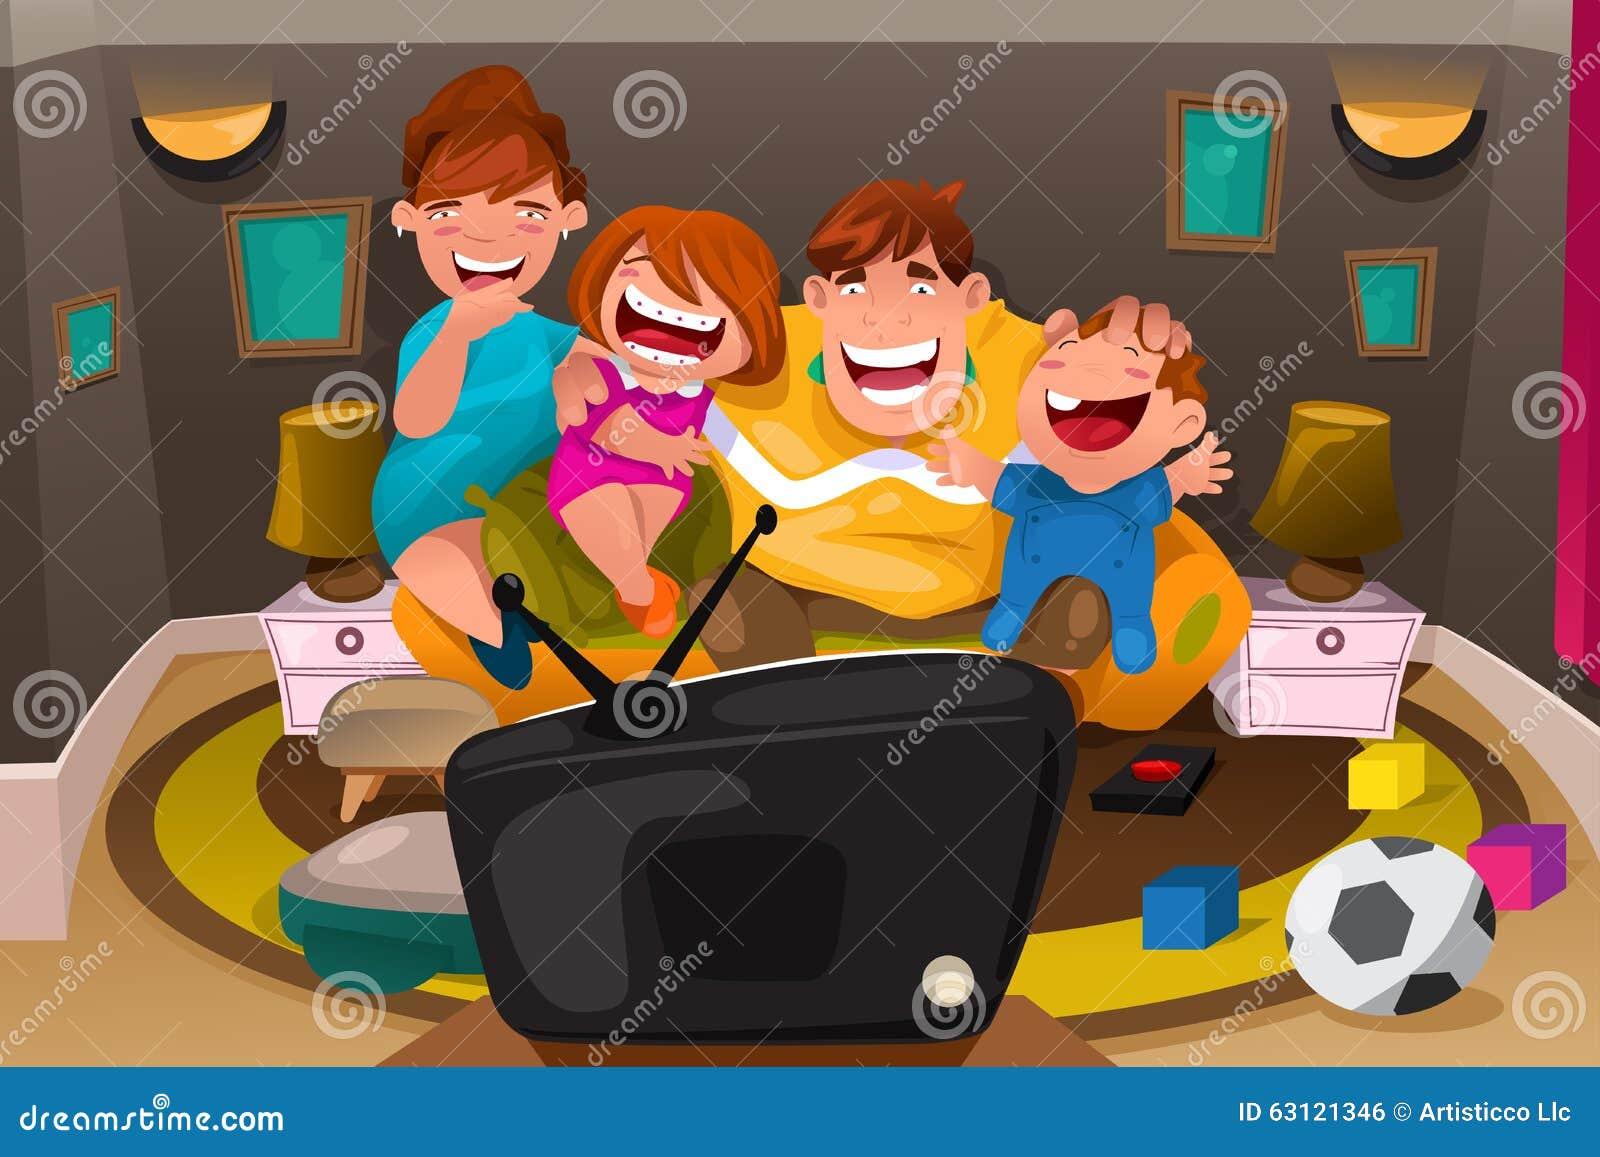 family watching tv together clipart wwwpixsharkcom